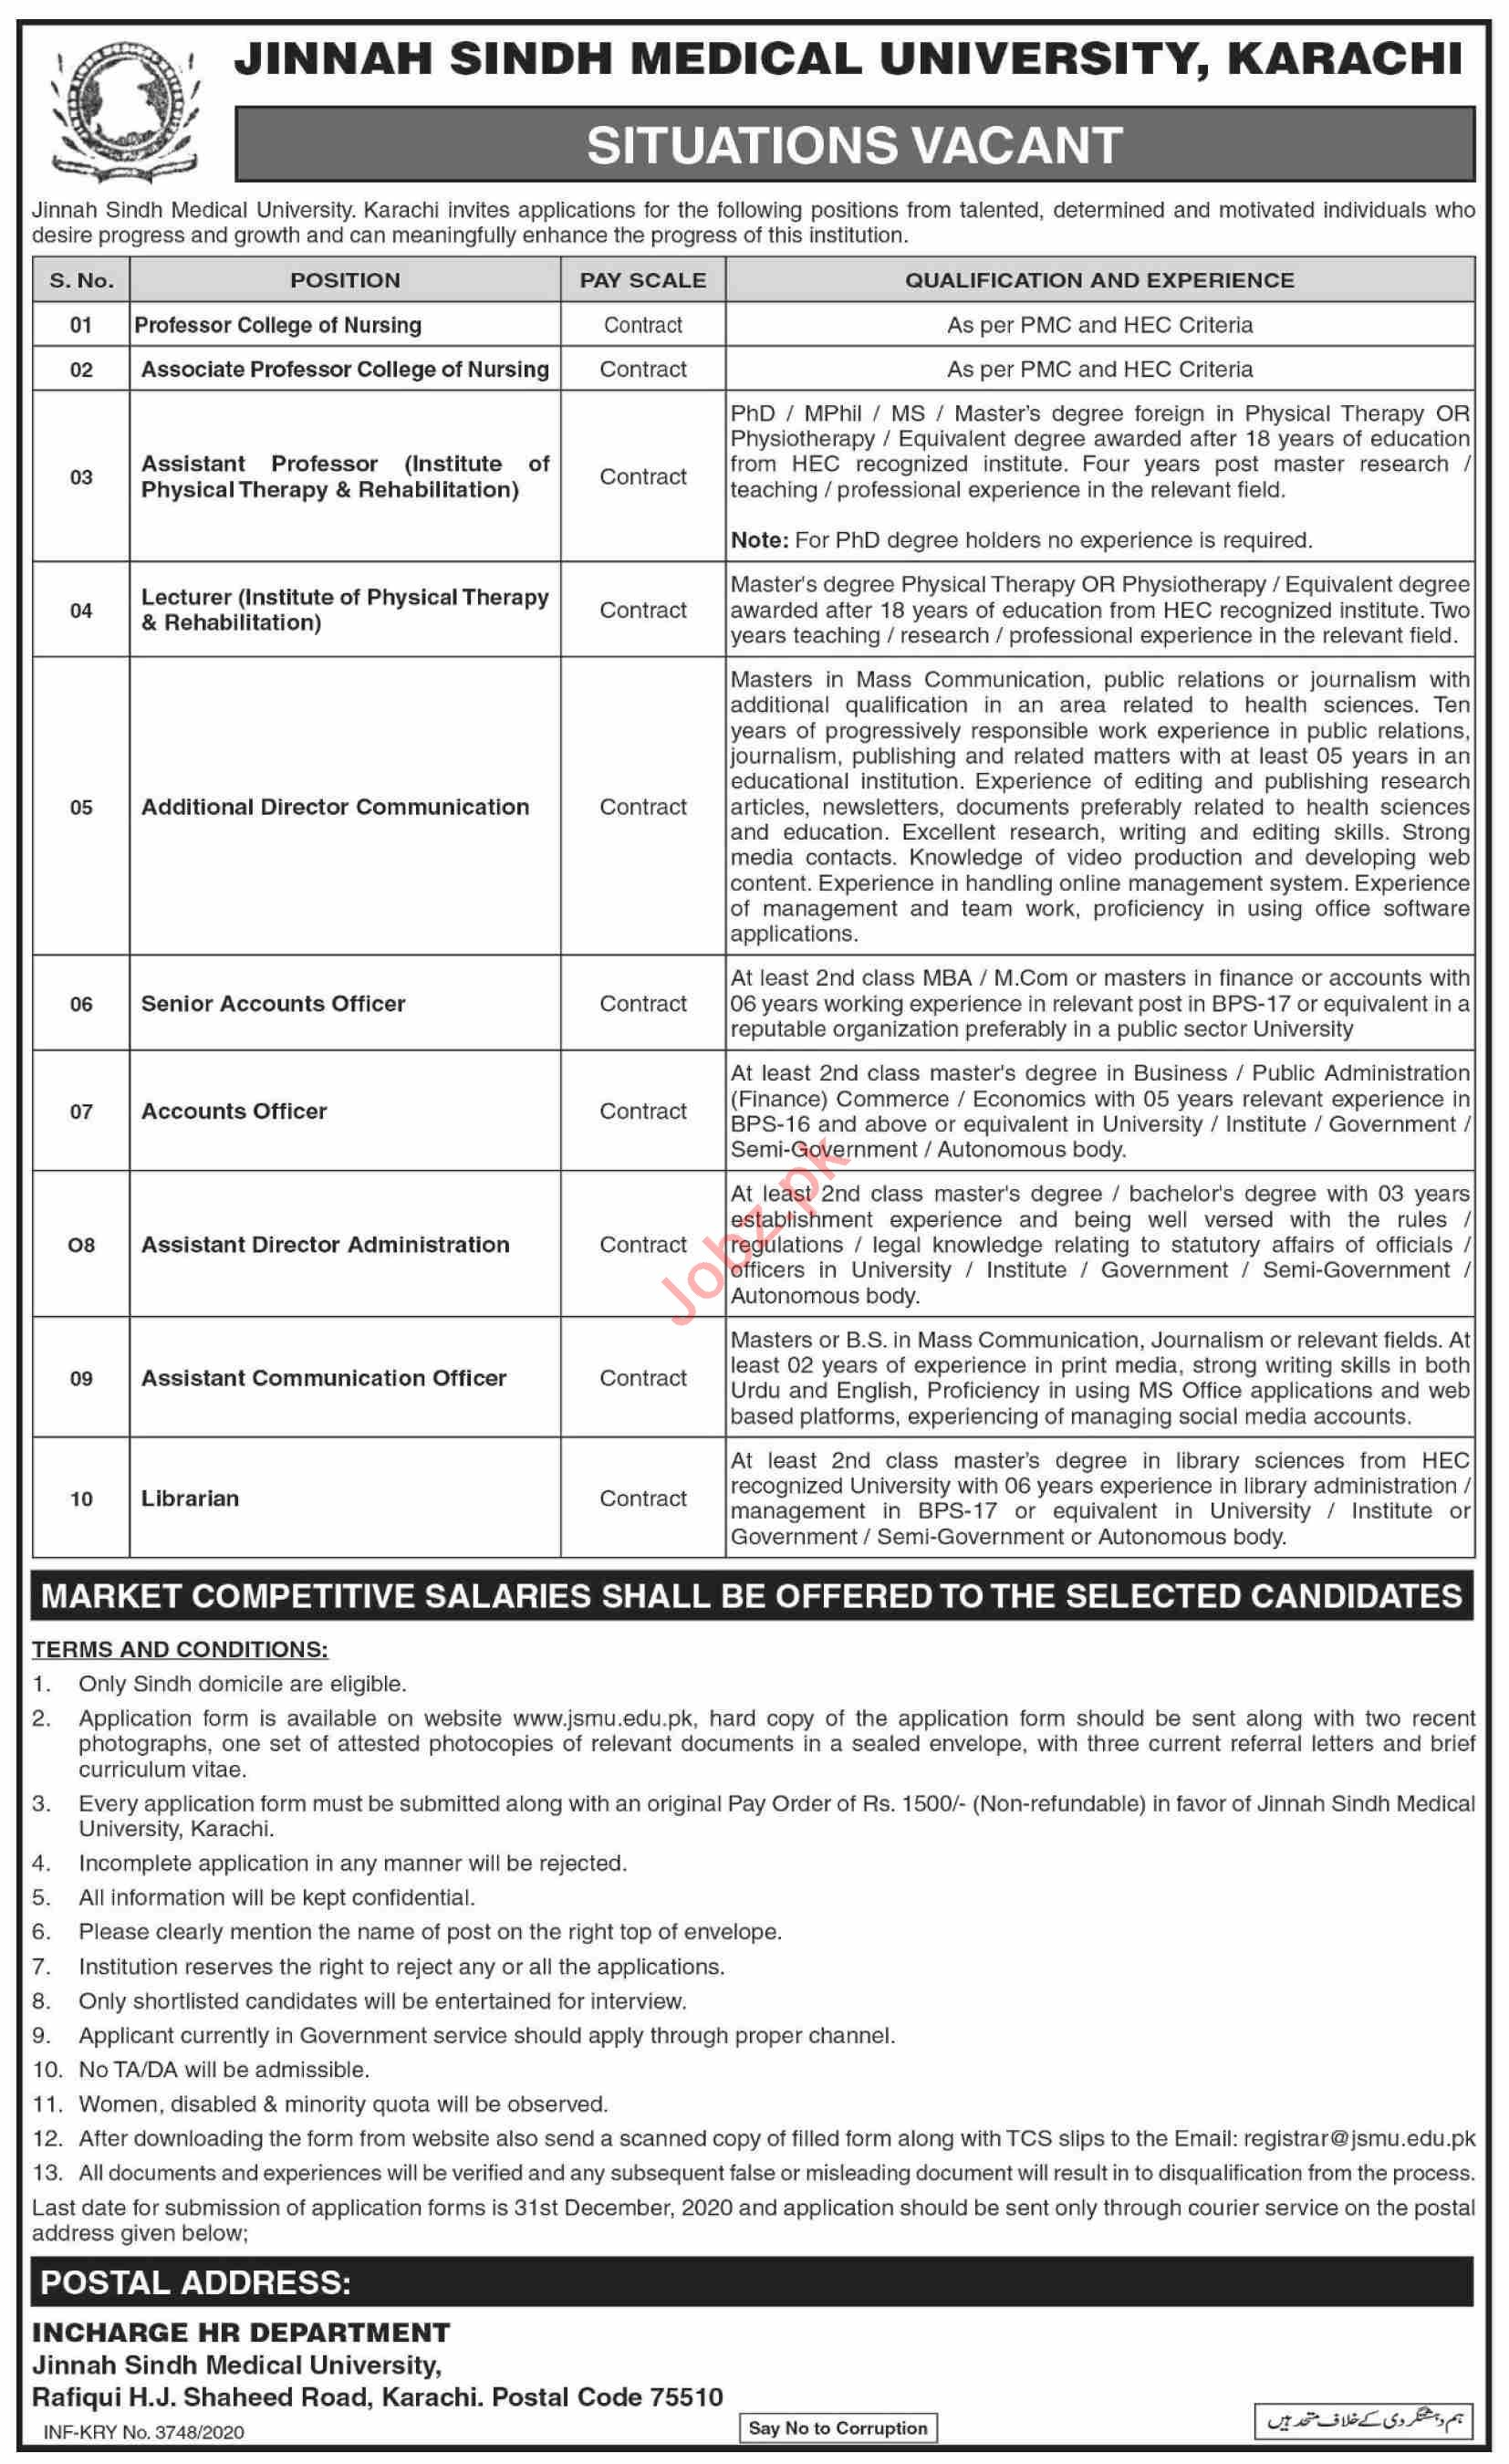 Jinnah Sindh Medical University JSMU Karachi Jobs 2021